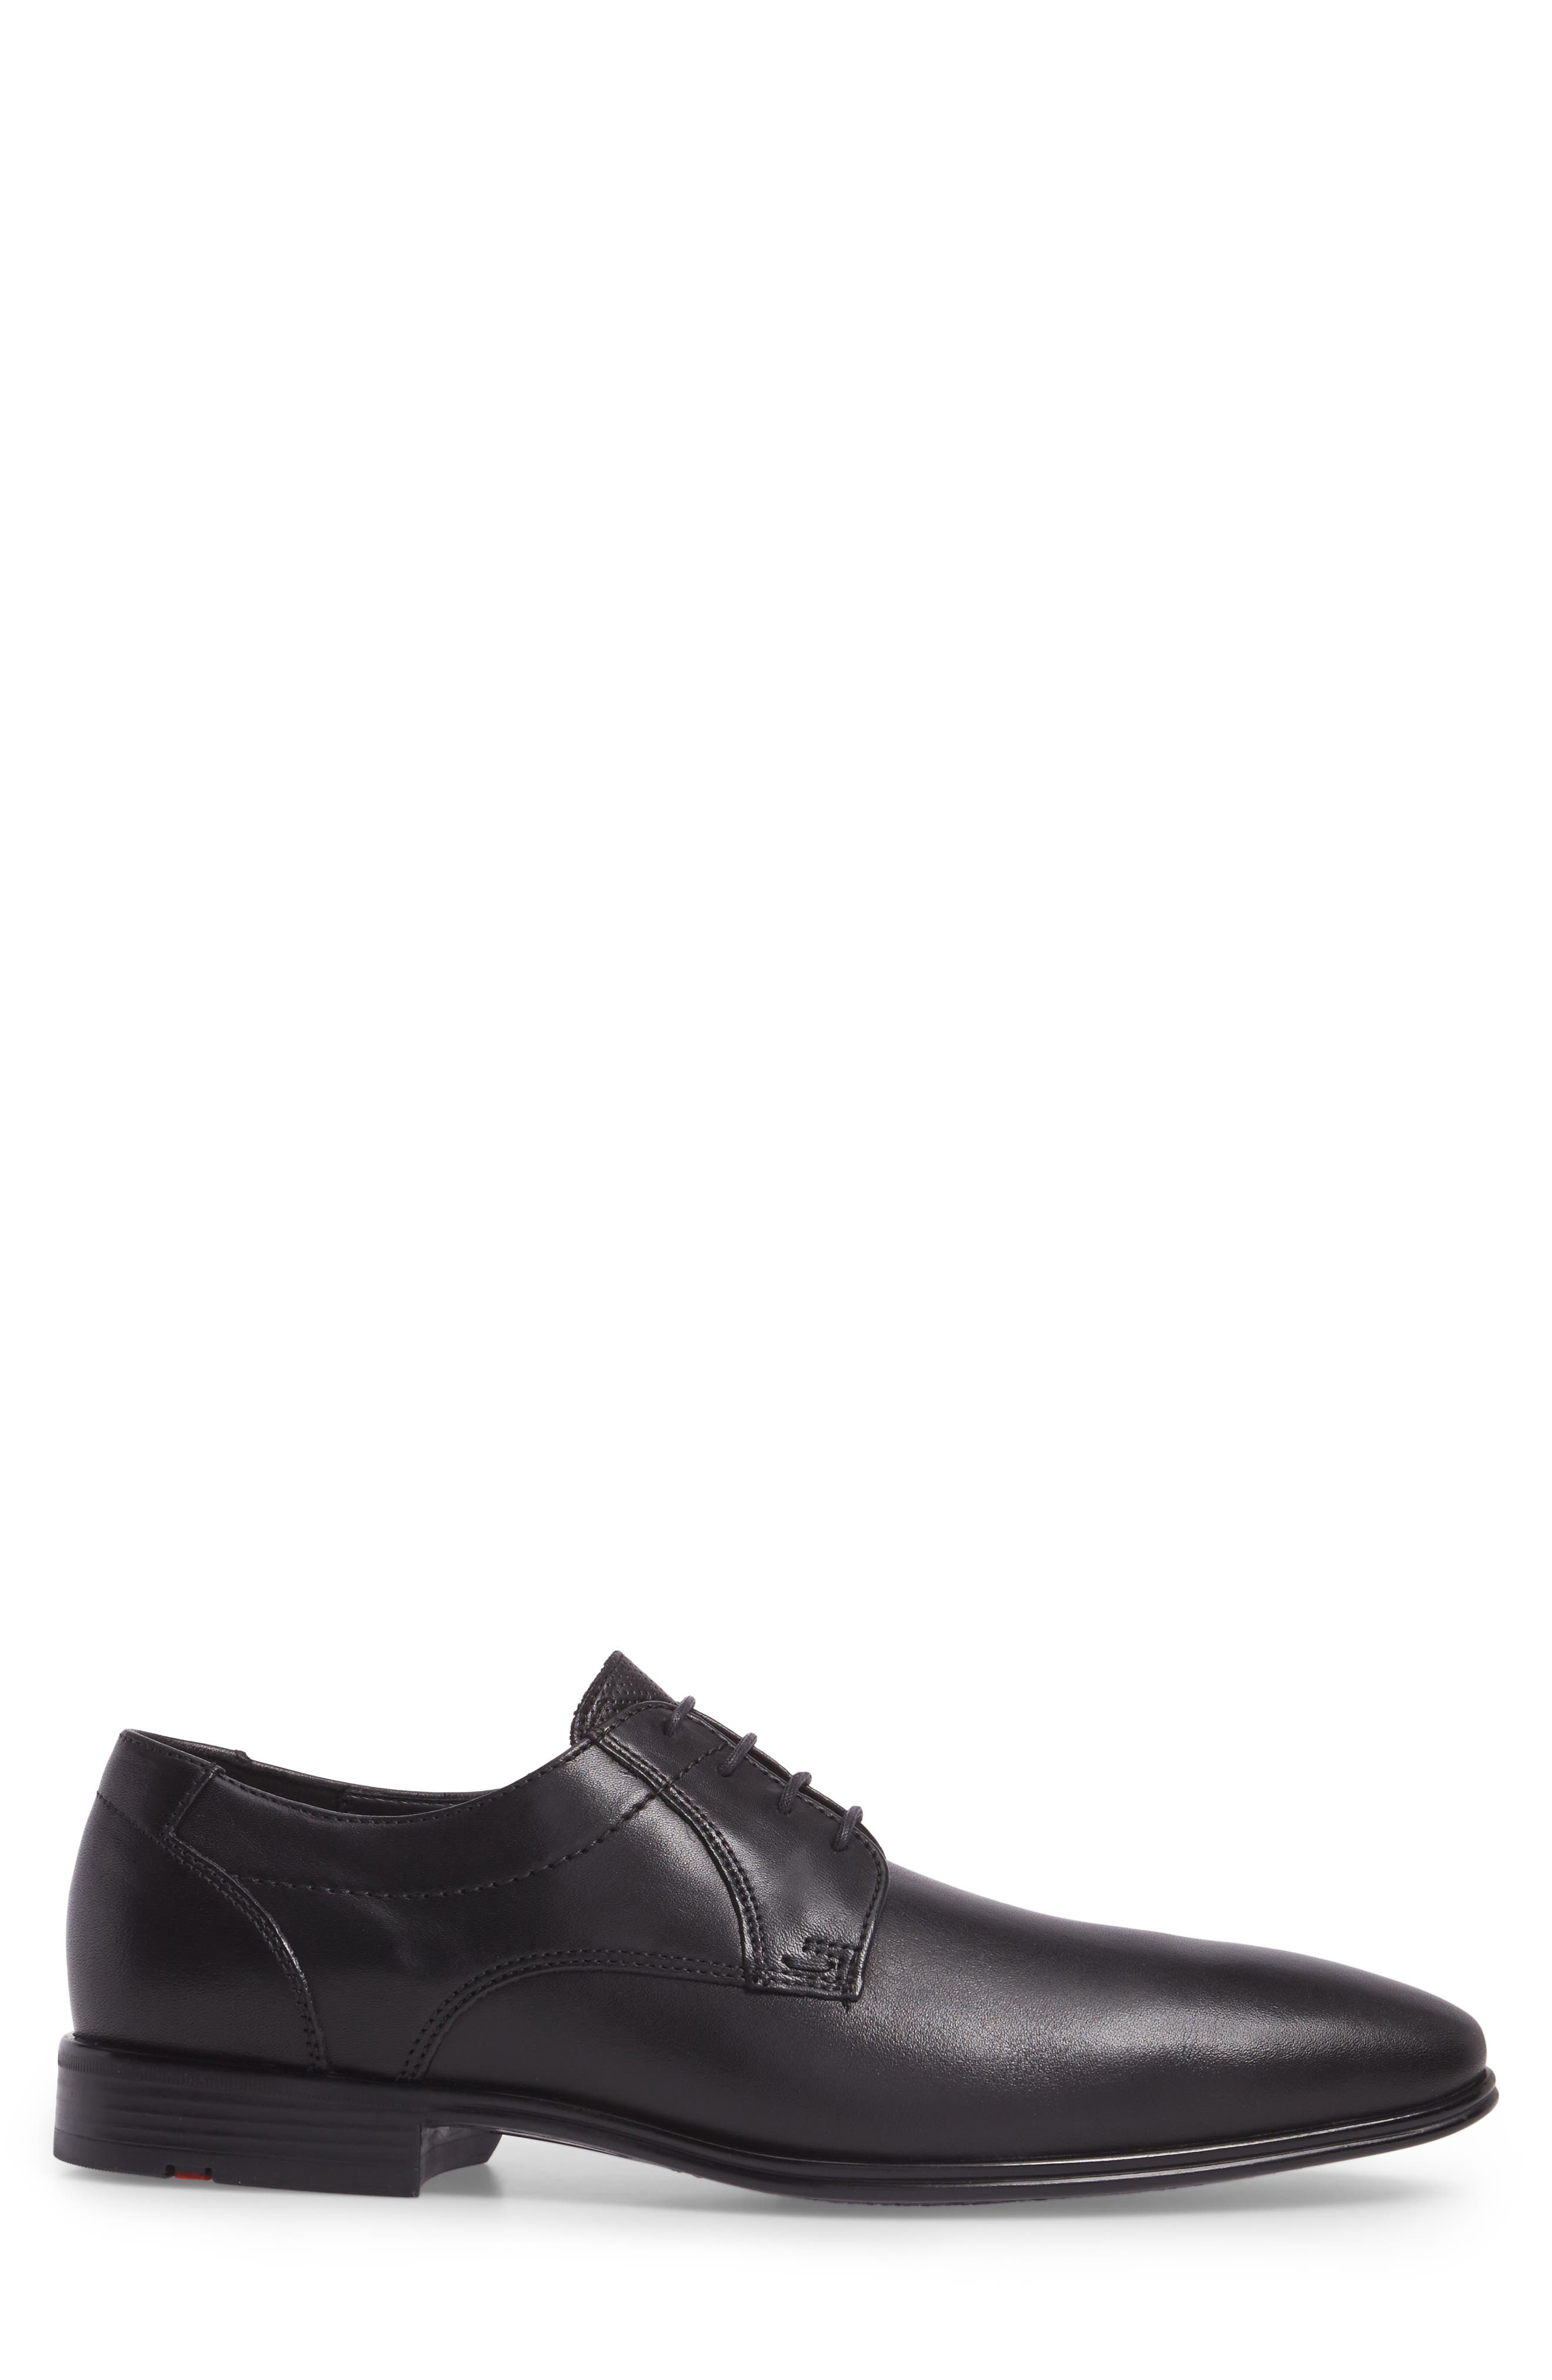 Osmond Plain Toe Derby,                             Alternate thumbnail 3, color,                             BLACK LEATHER